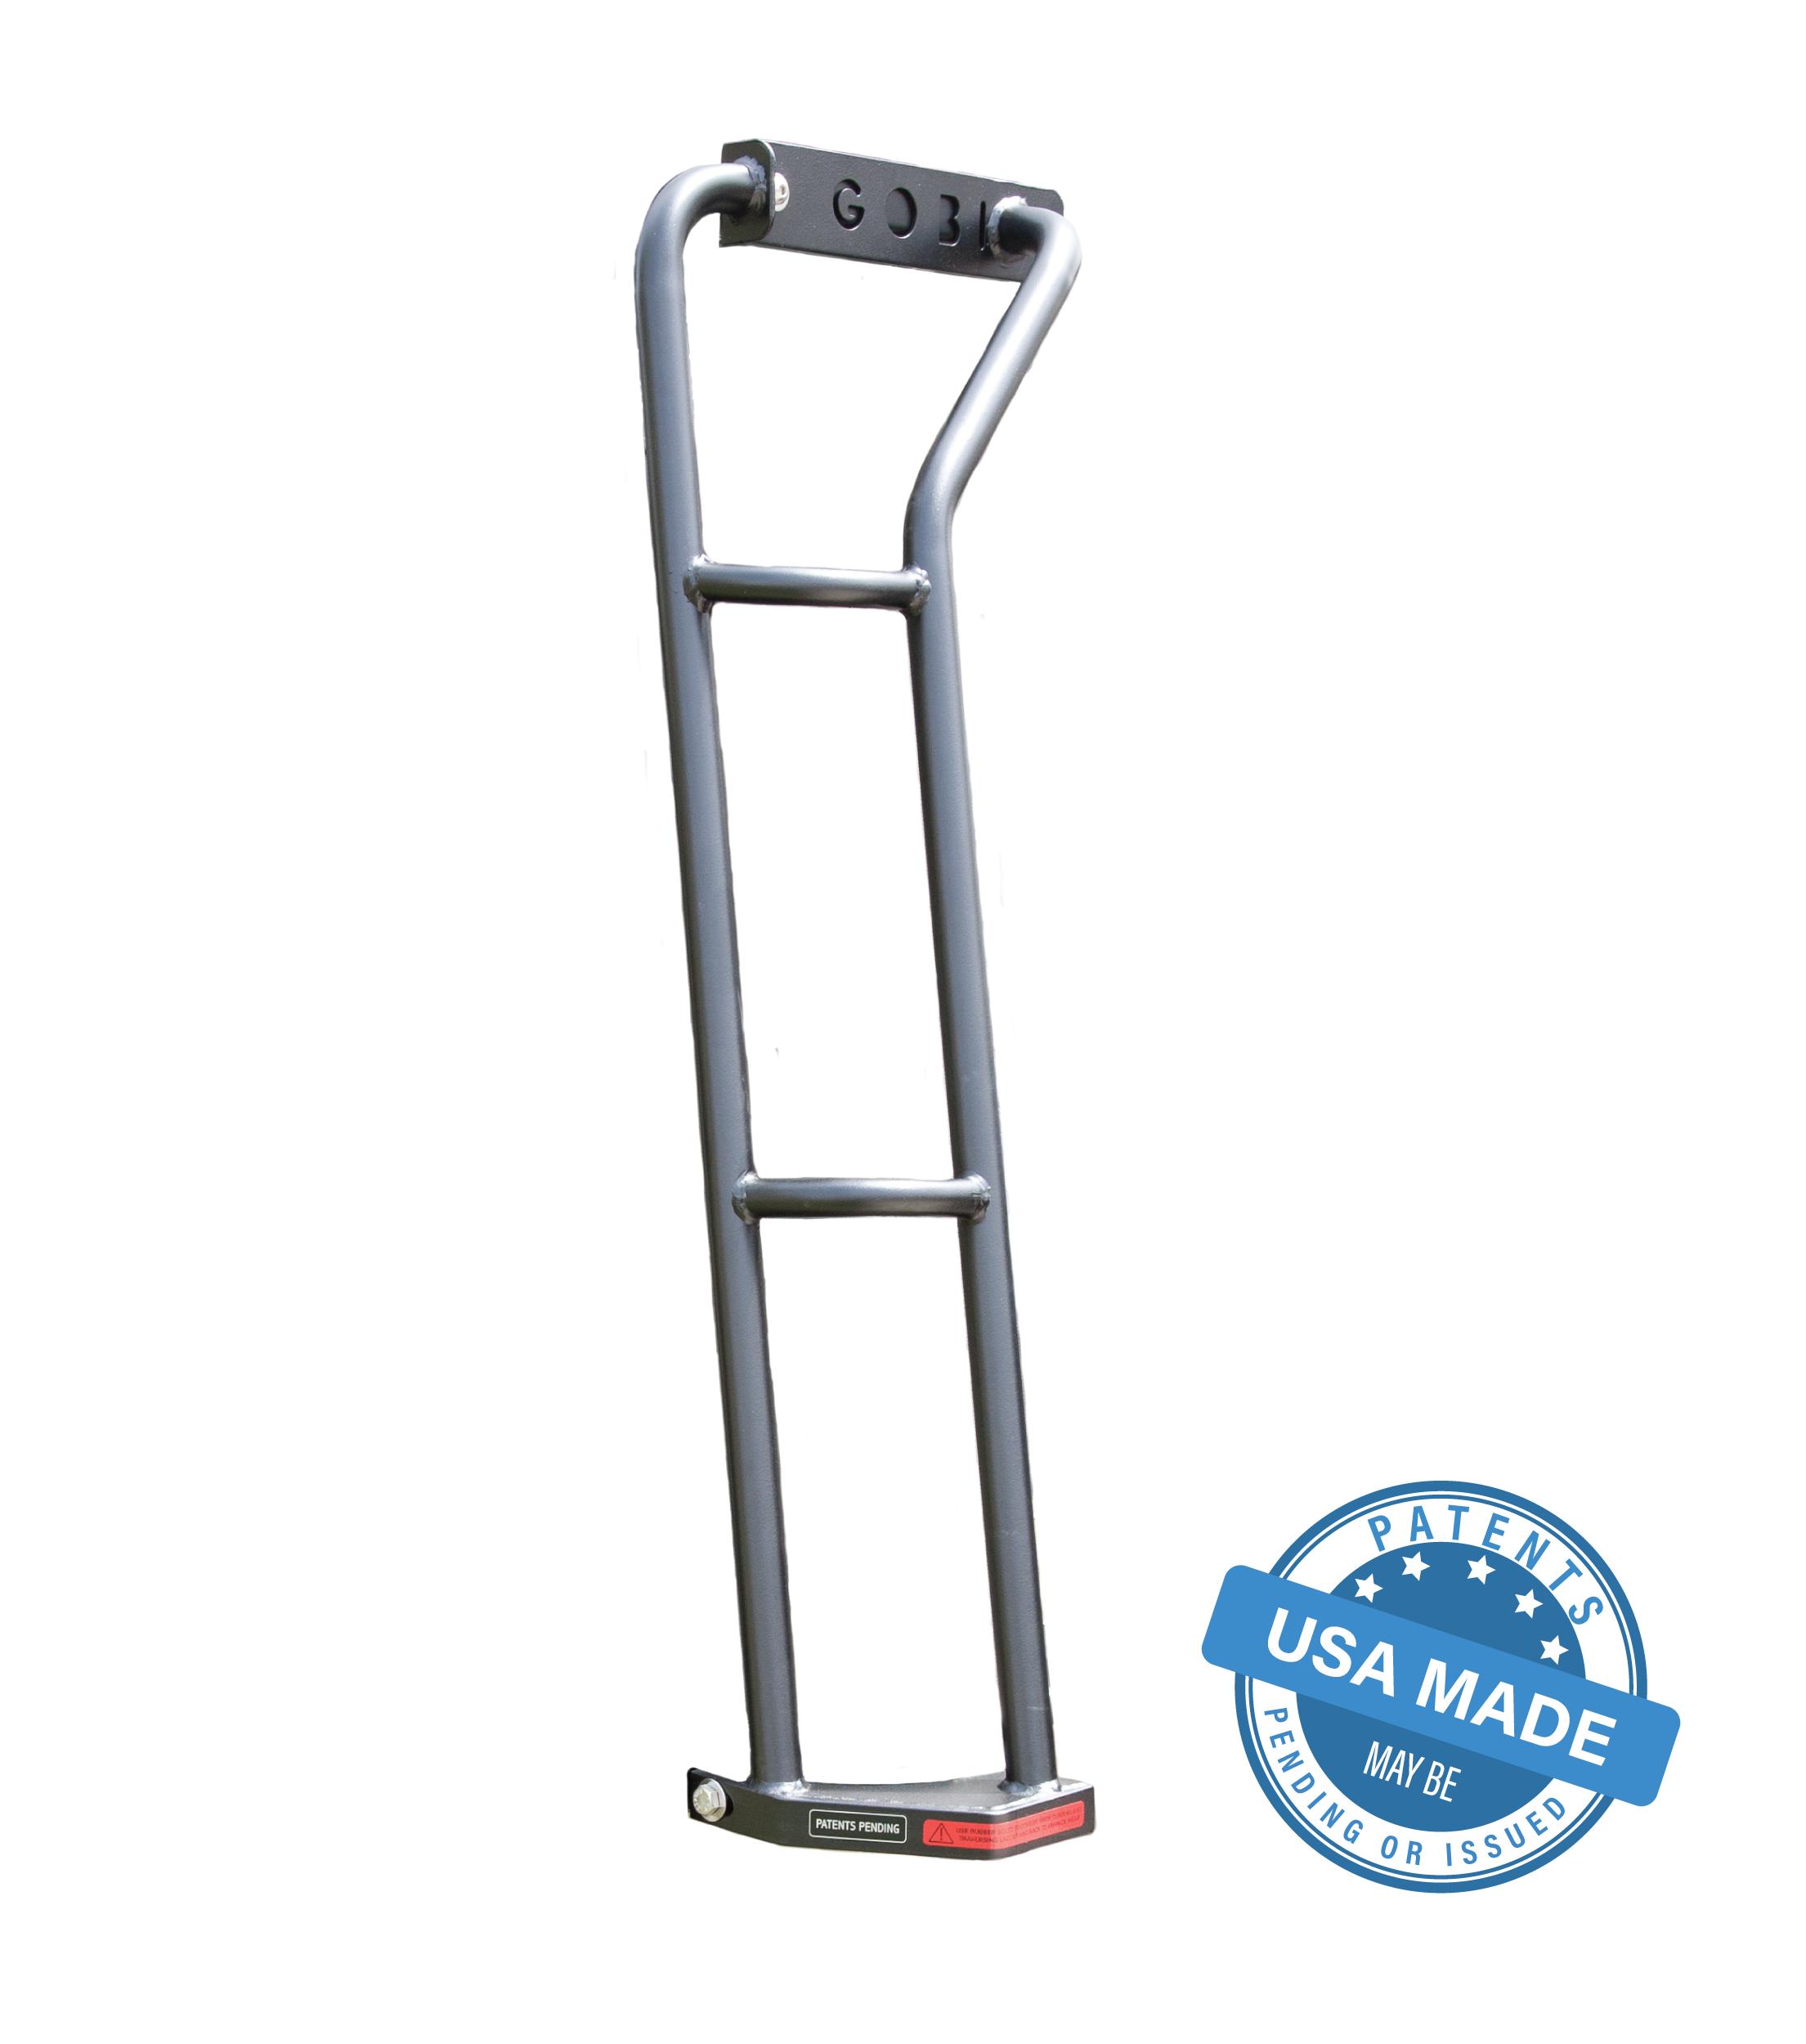 GOBI Jeep Wrangler TJ Rear Ladder